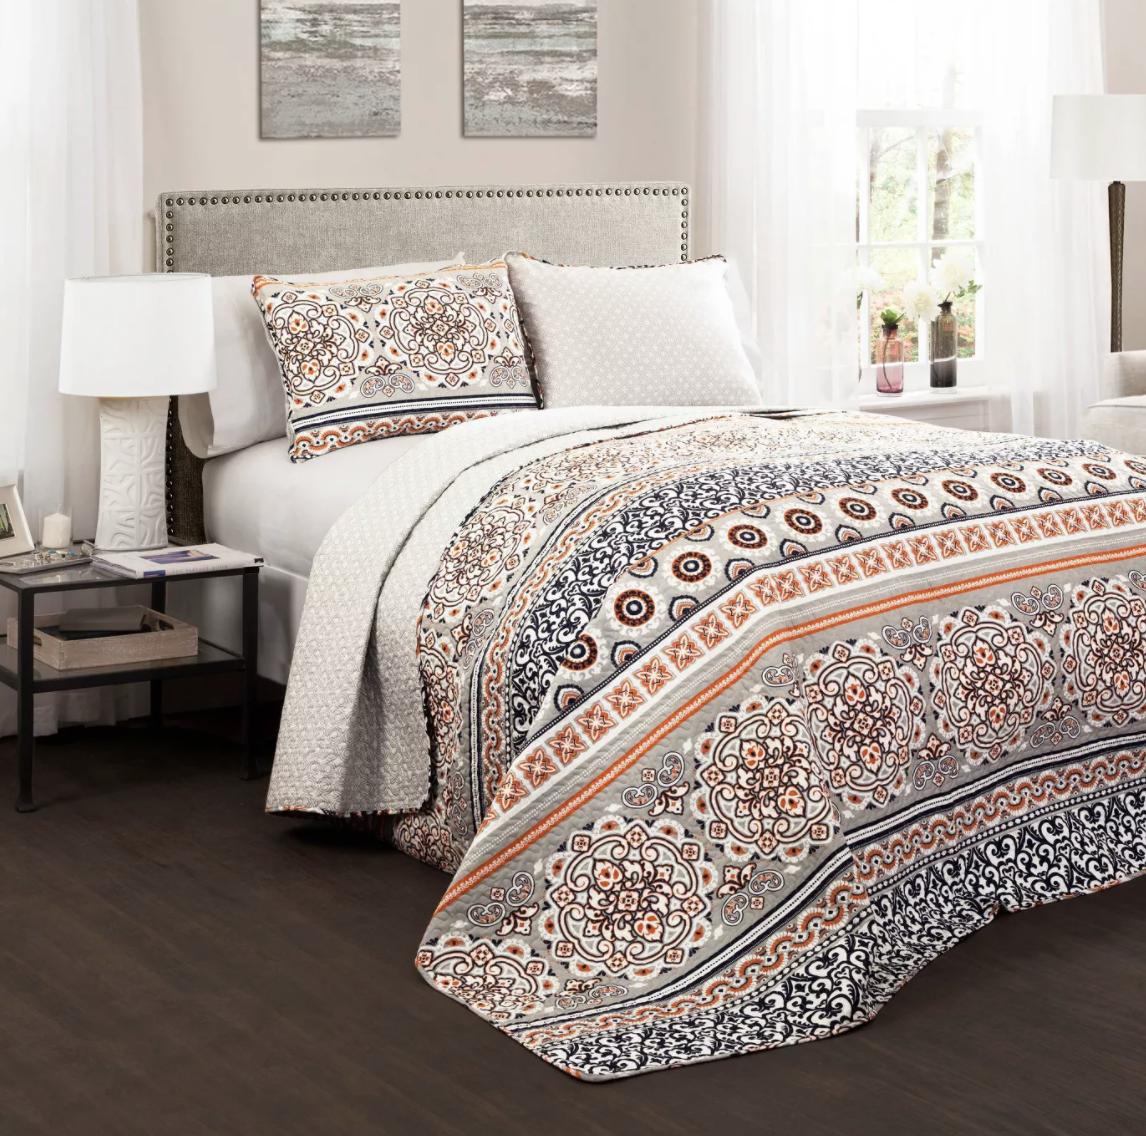 dorma bedding sale